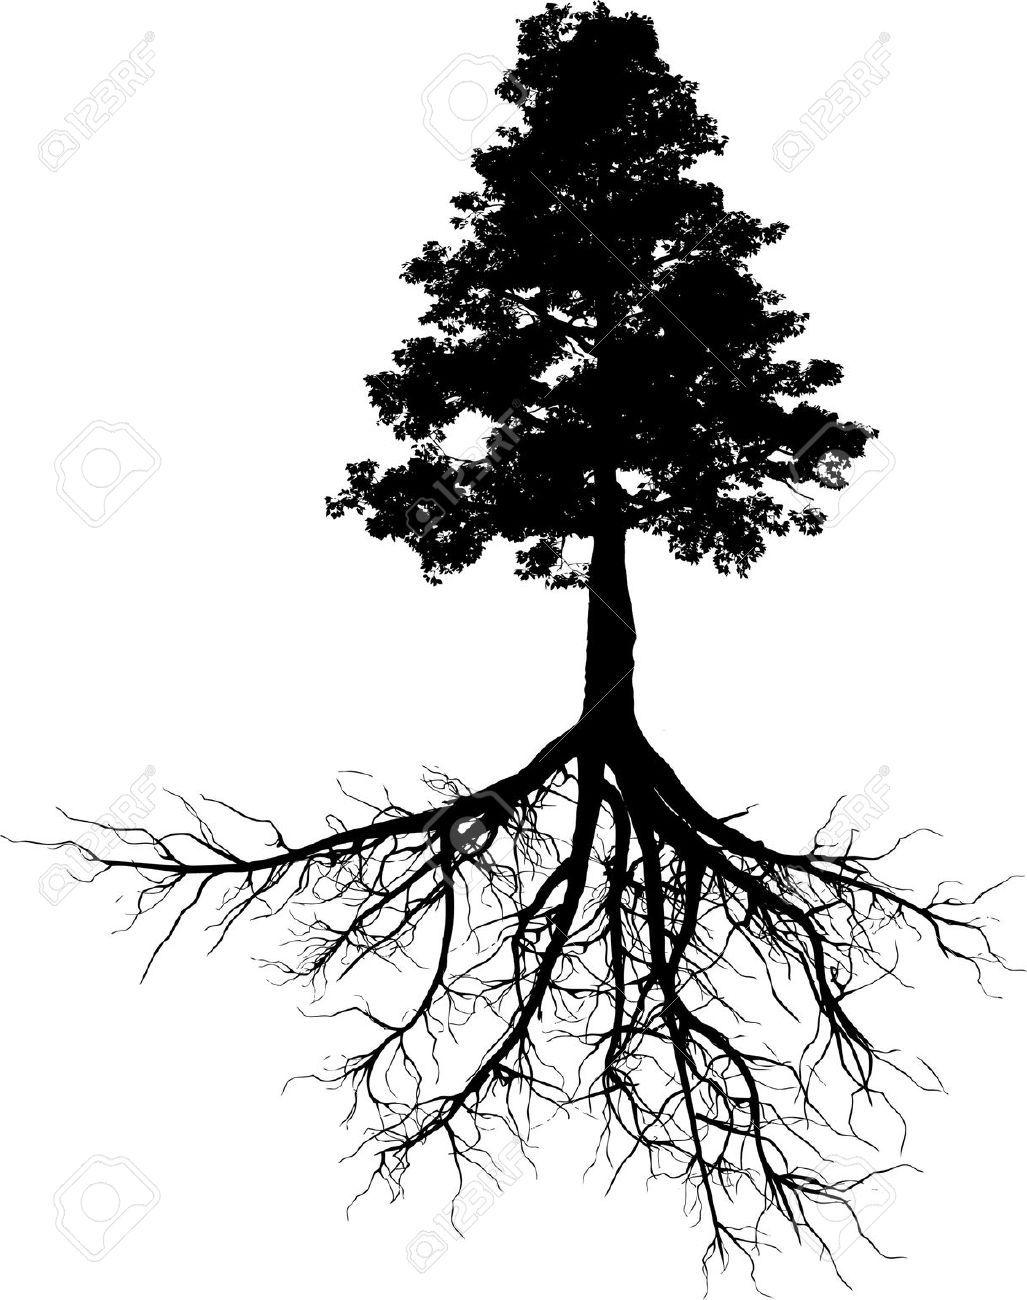 Fullsize Of Pine Tree Roots